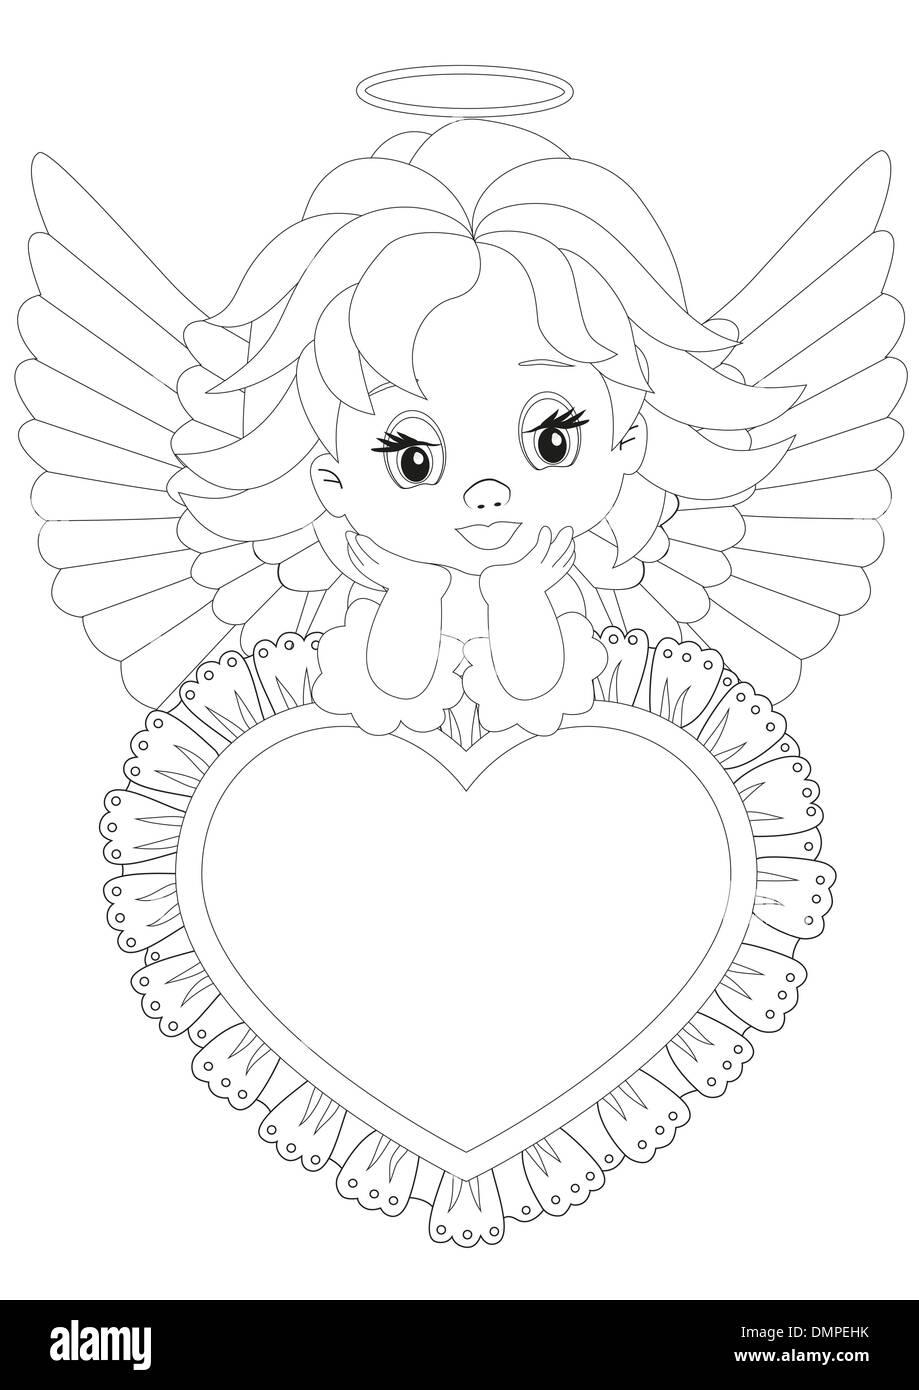 kleine Engel Malvorlagen Stock-Vektorgrafik - Alamy